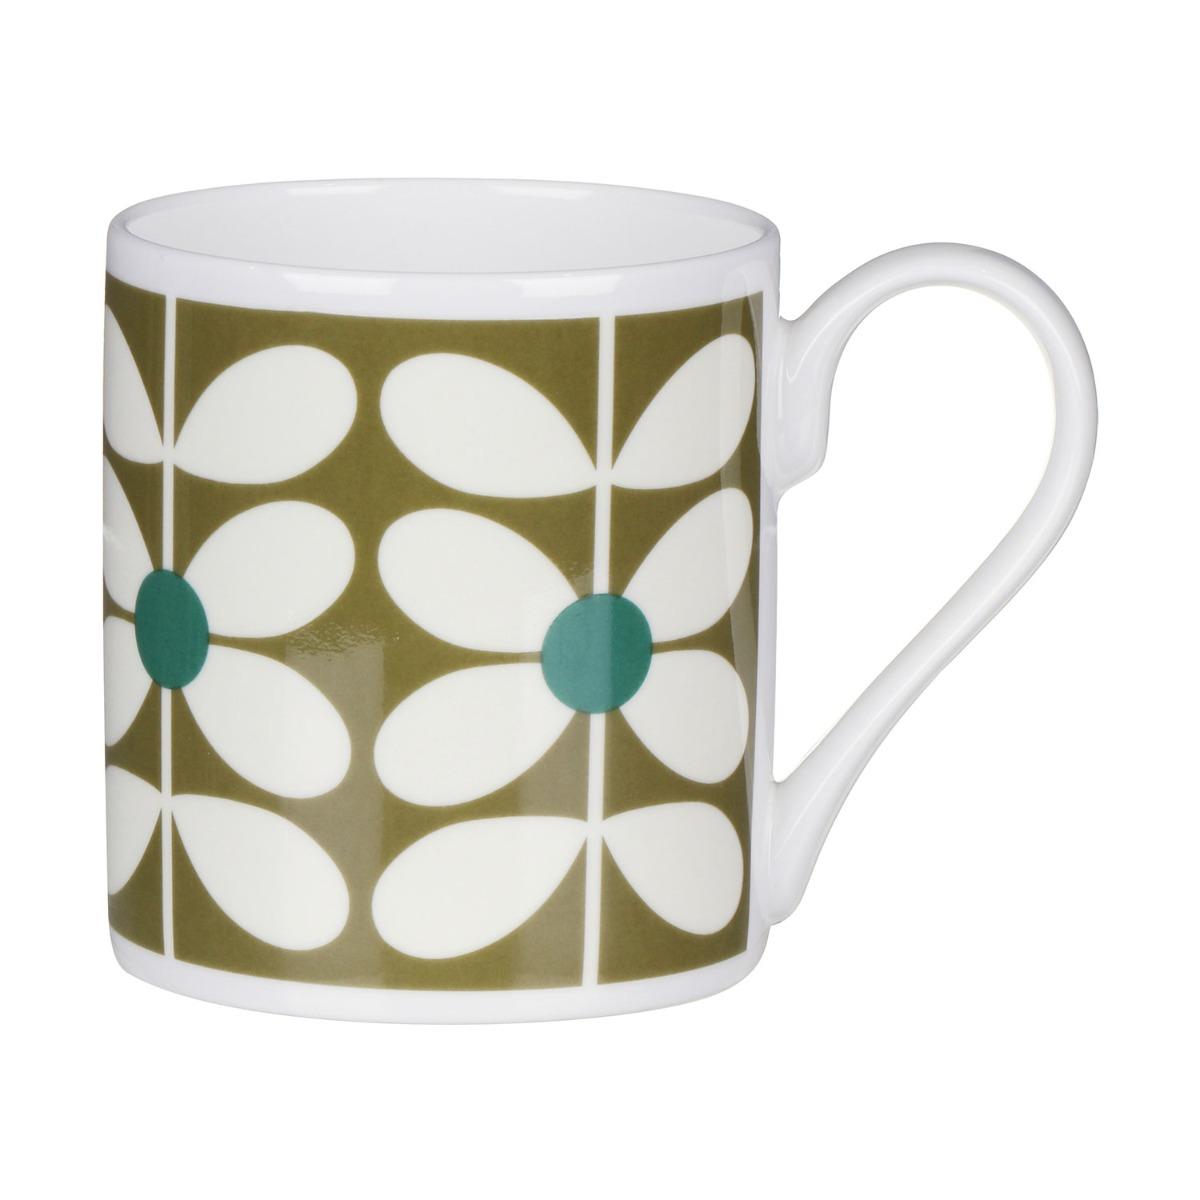 Orla Kiely 60's Stem Olive Standard Mug